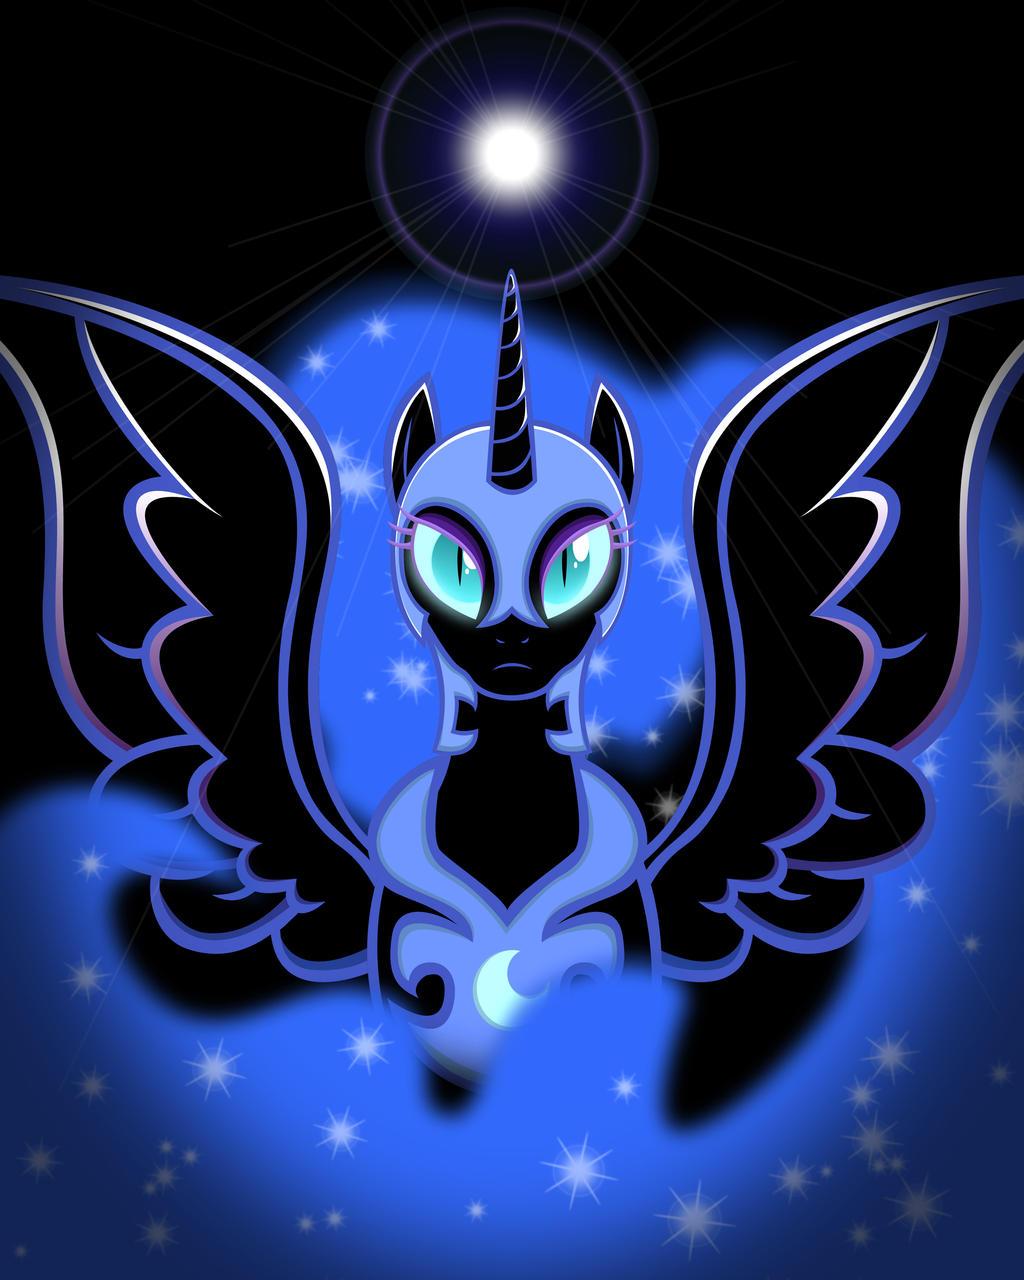 (REMASTERED) Nightmare Moon Shines Bright by DarkLight02